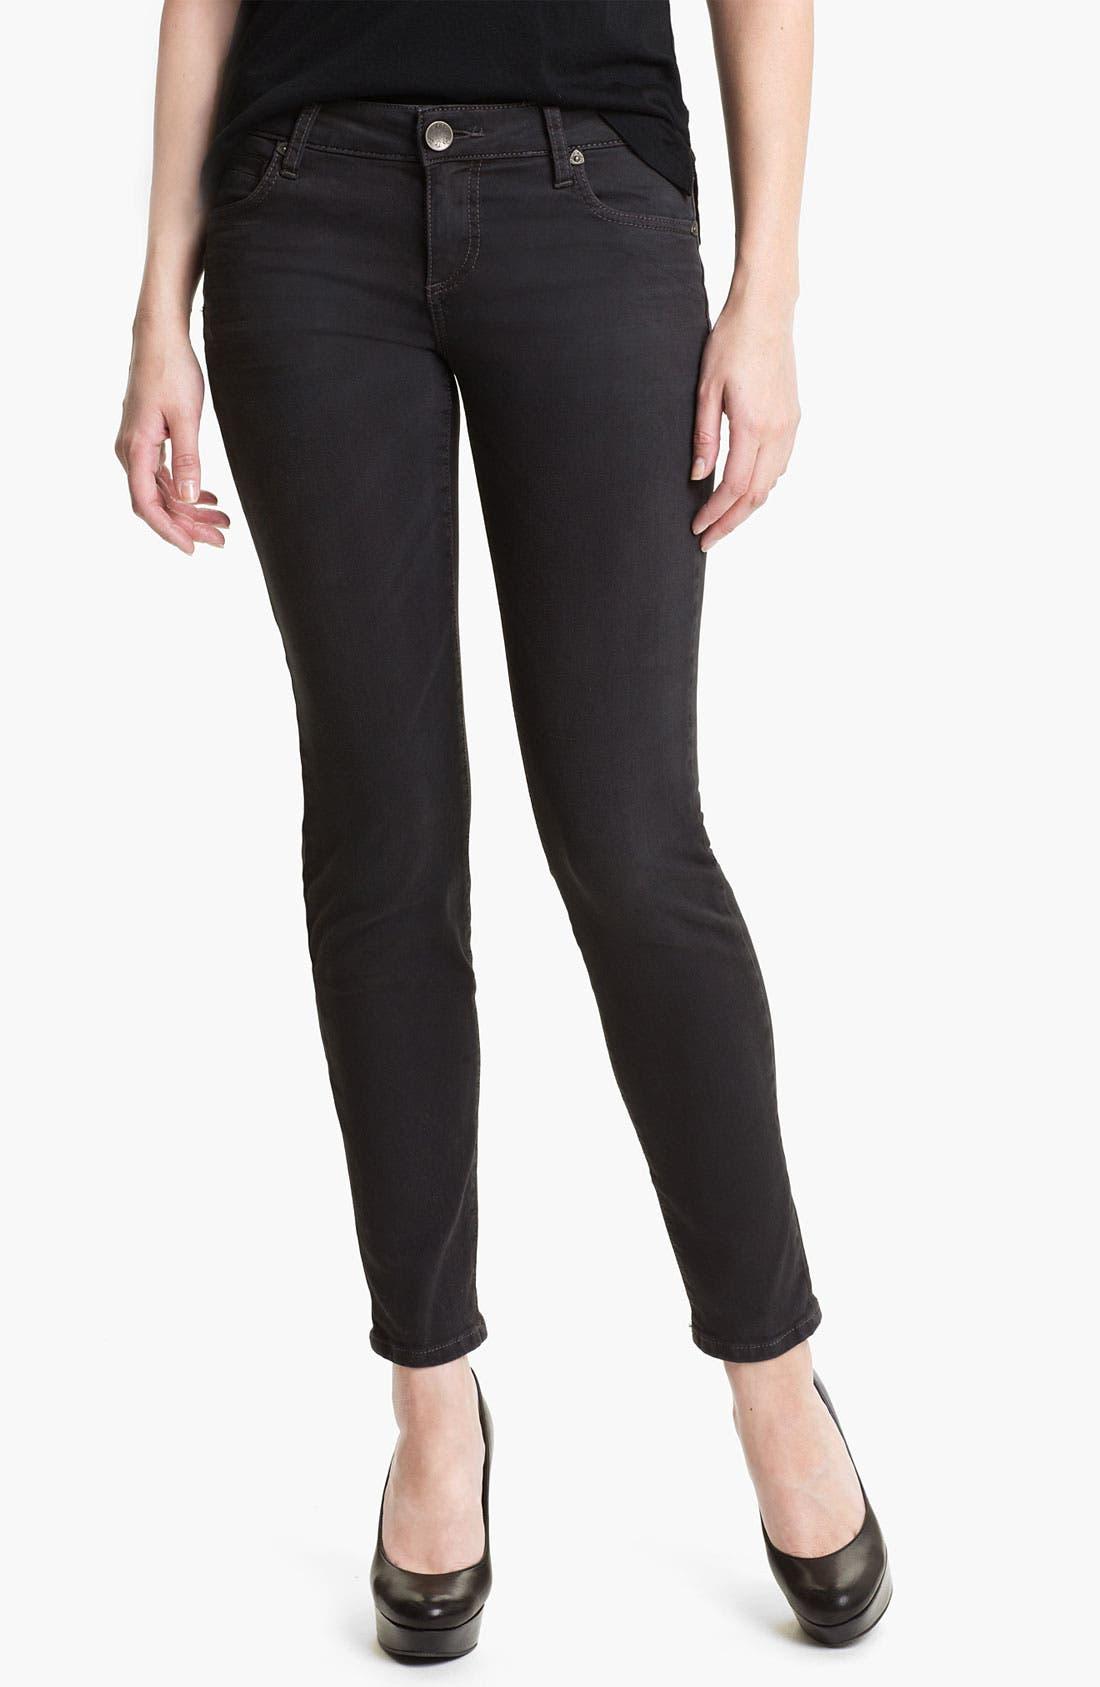 Main Image - KUT from the Kloth 'Diana' Skinny Jeans (Heavenly)